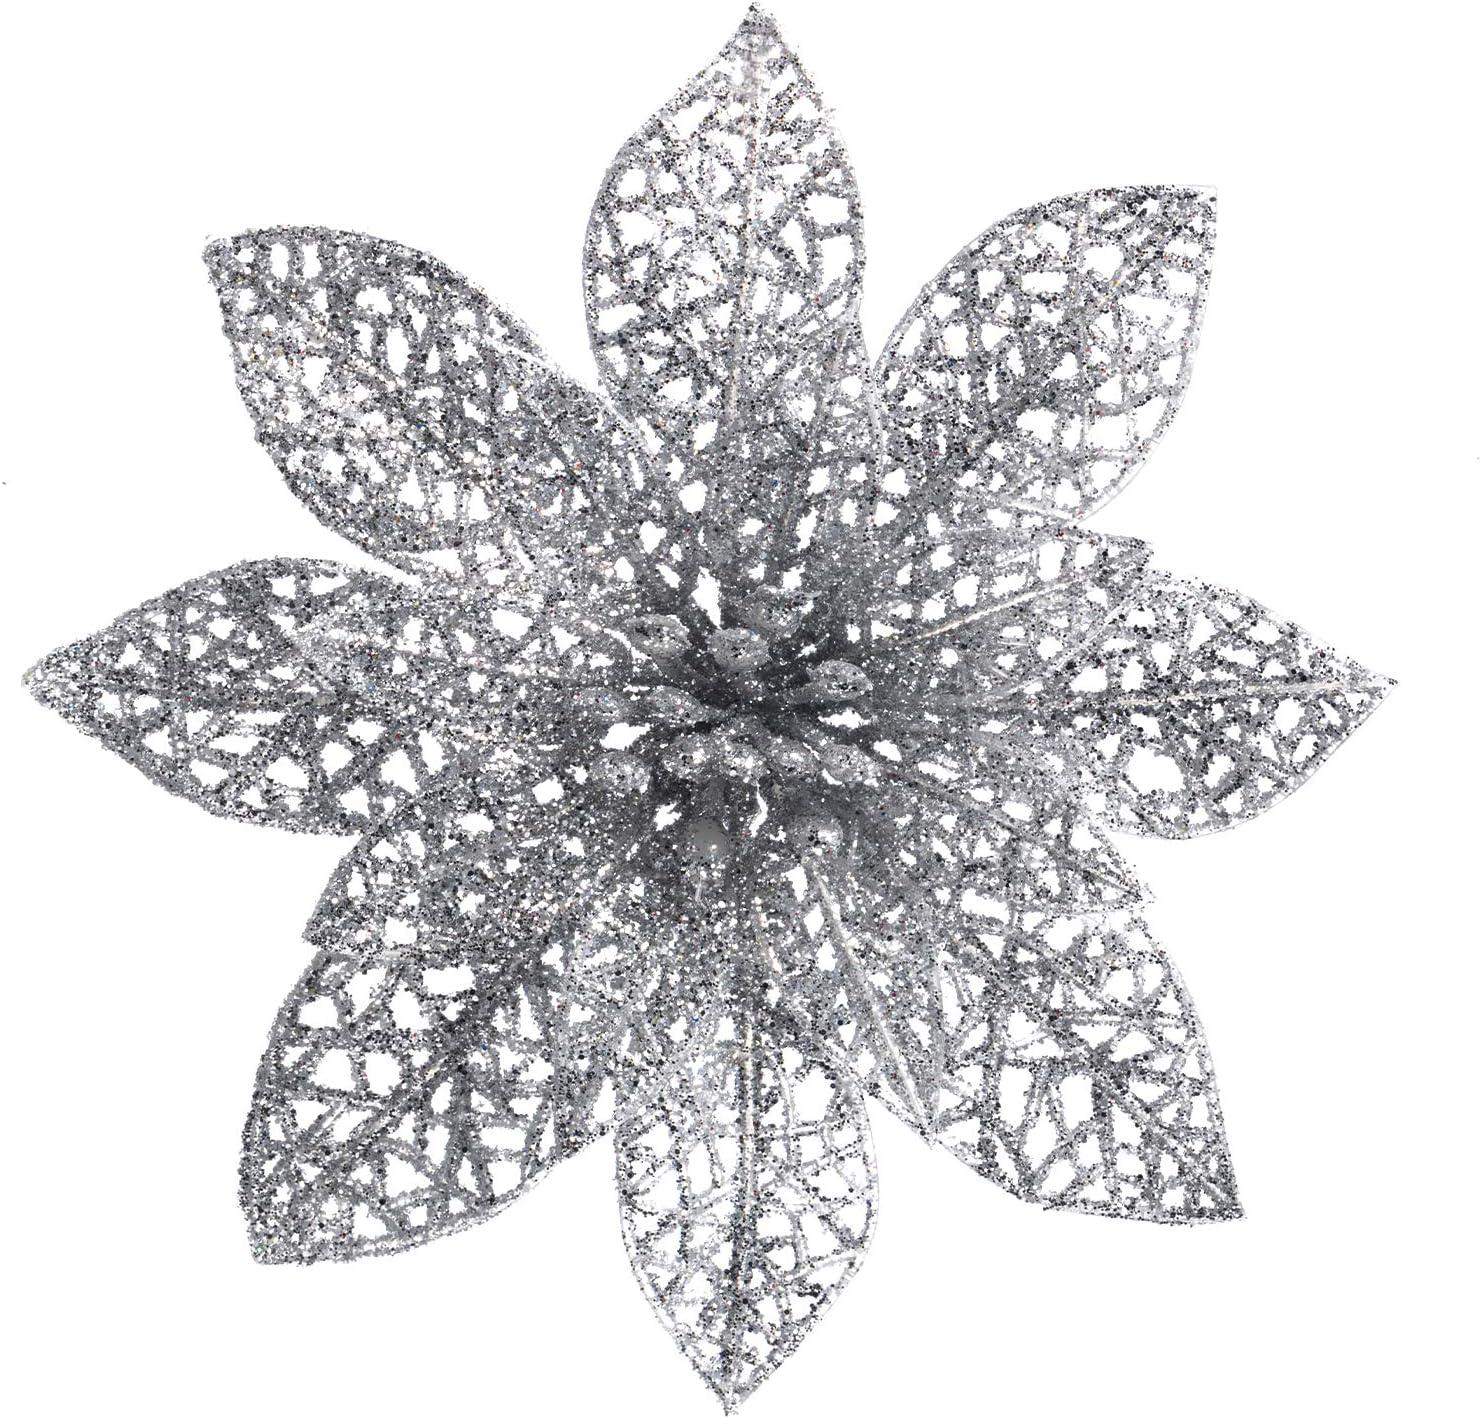 XmasExp 10 Pcs Glitzy Silver Poinsettia Bushes Christmas Tree Ornaments, Glitter Poinsettia Flowers Christmas Decorations